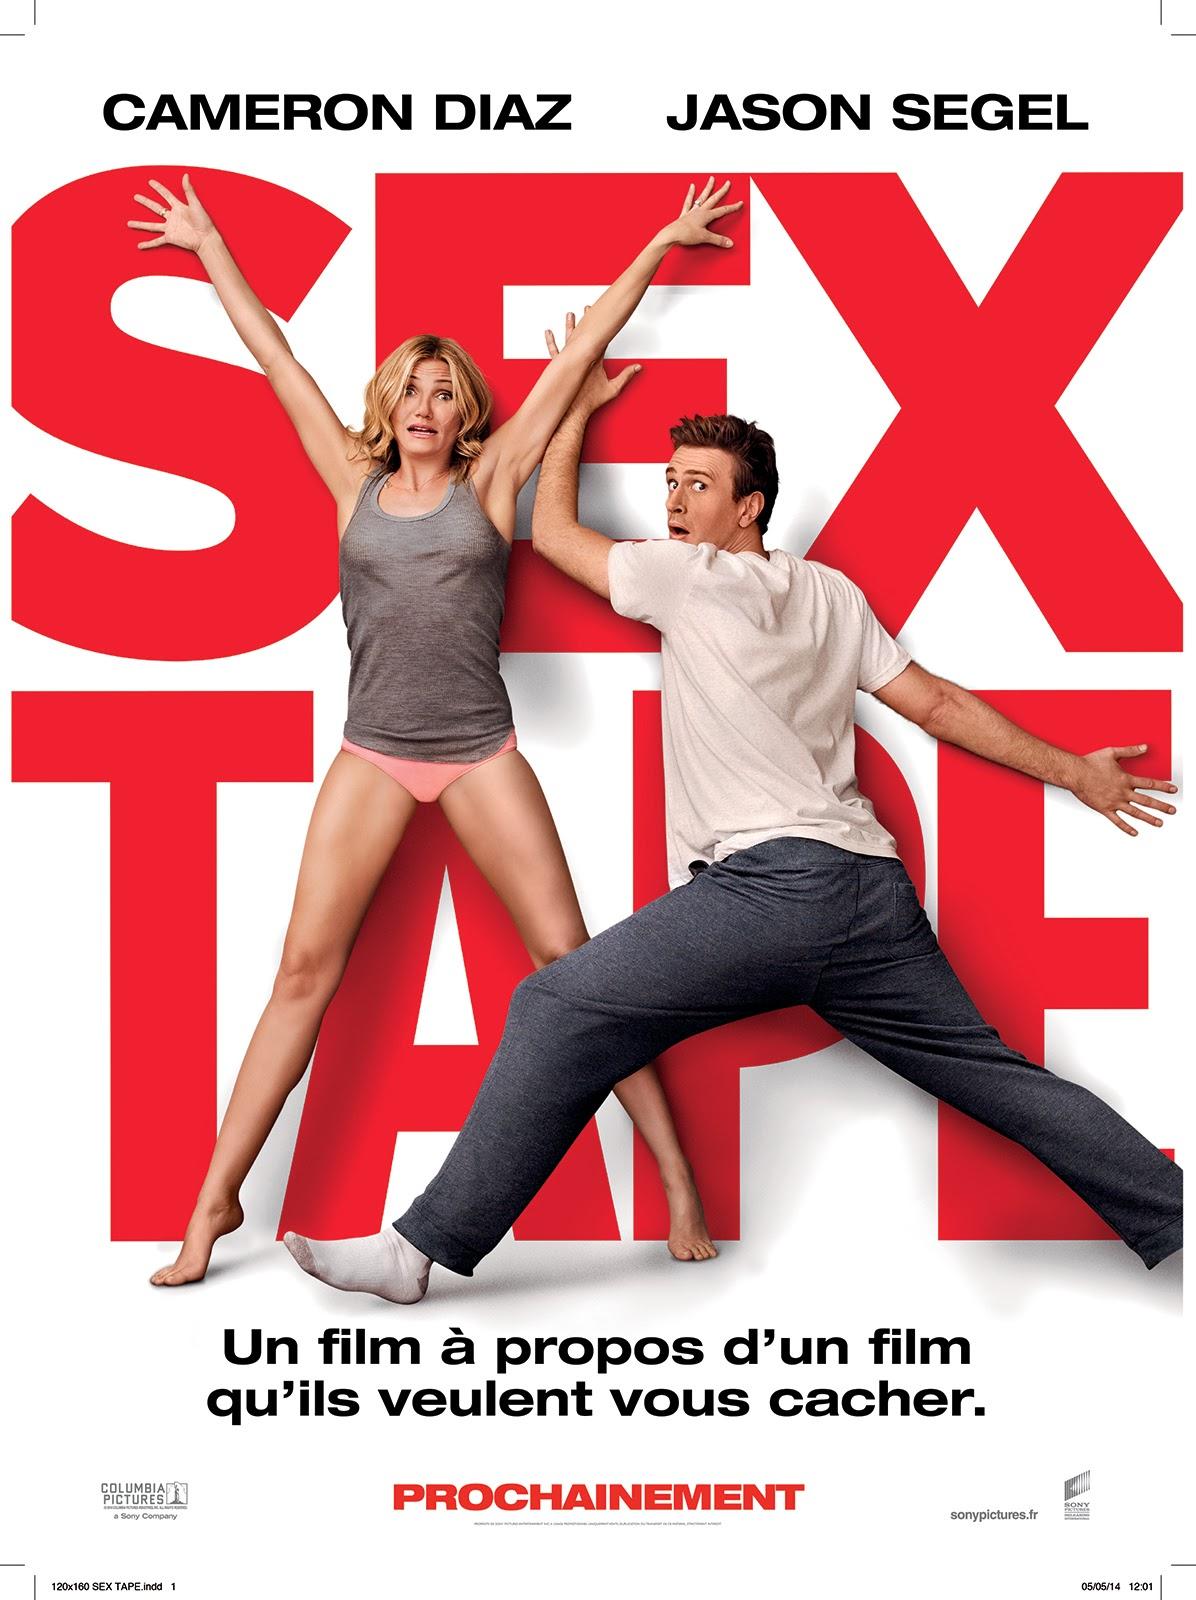 http://fuckingcinephiles.blogspot.fr/2014/09/critique-sex-tape.html